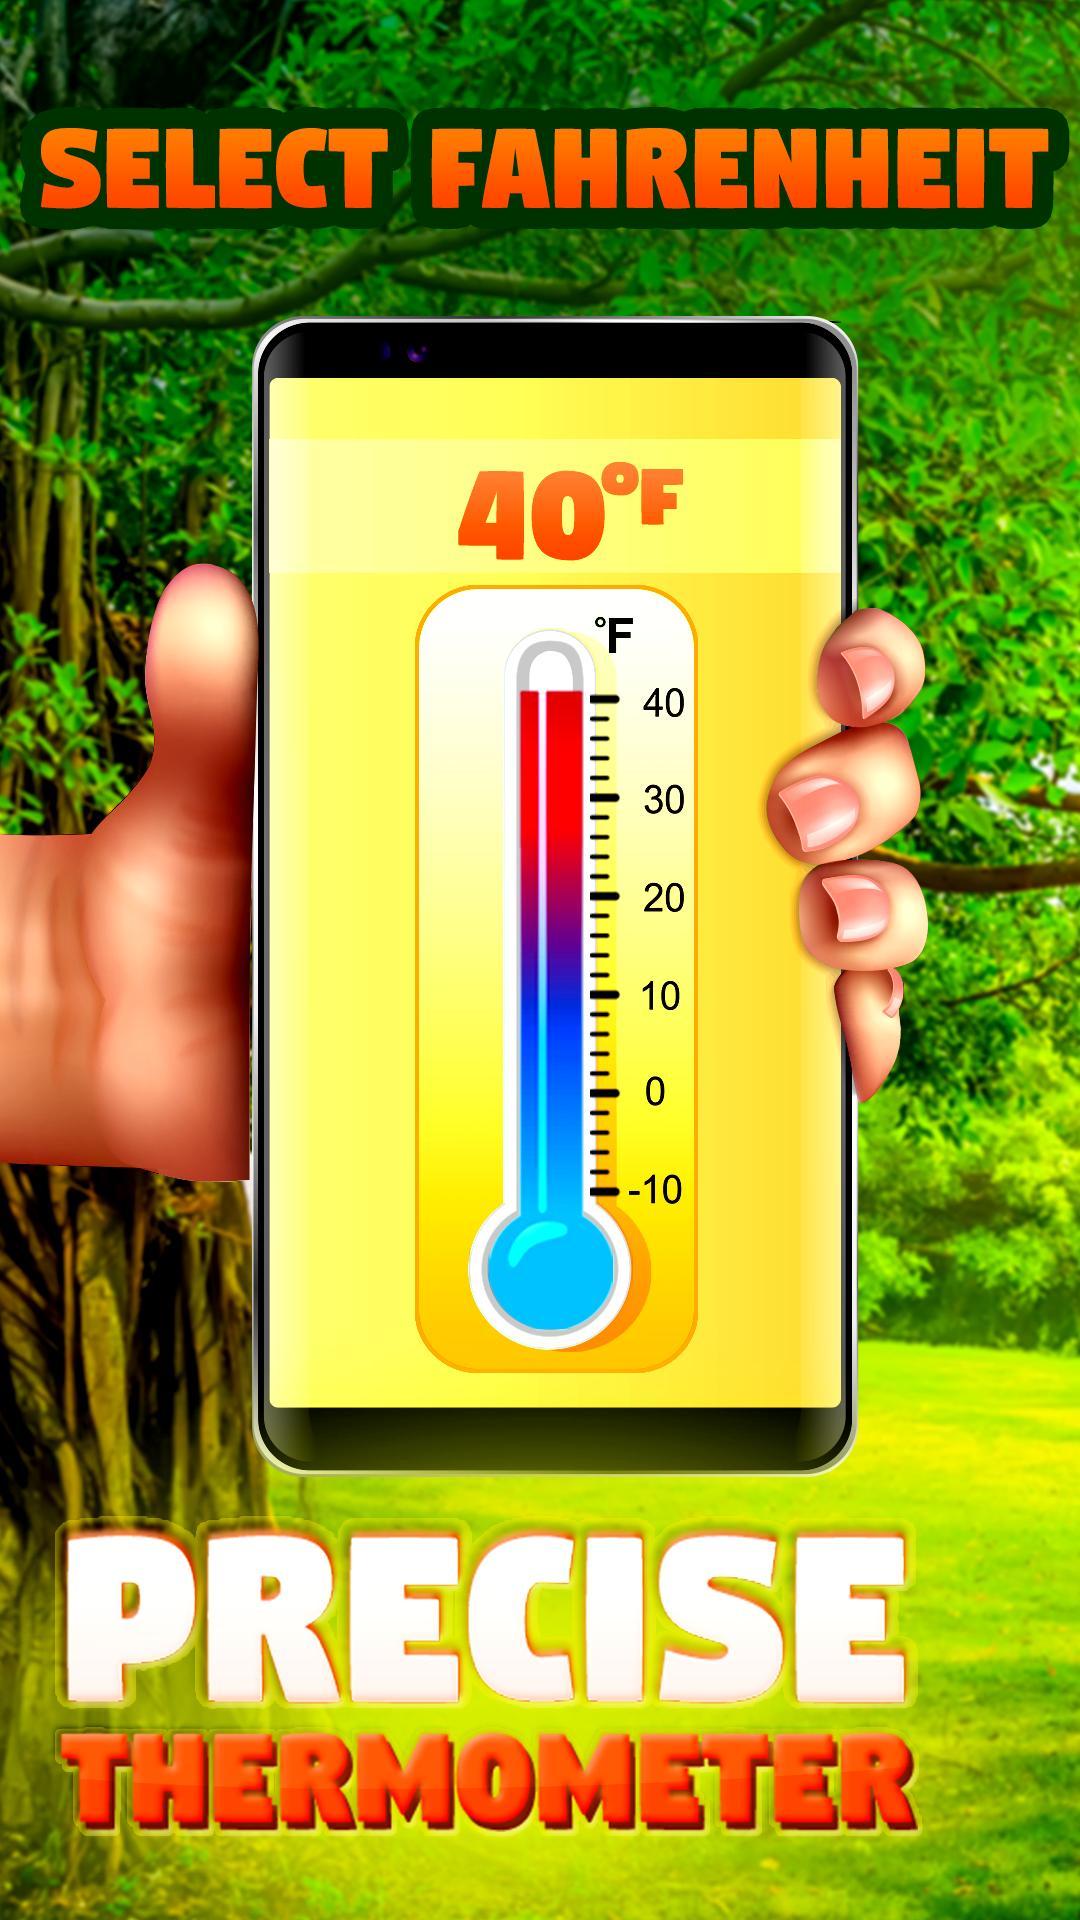 Termometro Preciso En Grados Celsius Y Fahrenheit For Android Apk Download Converting between degrees of celsius and fahrenheit is common when it comes to temperature. termometro preciso en grados celsius y